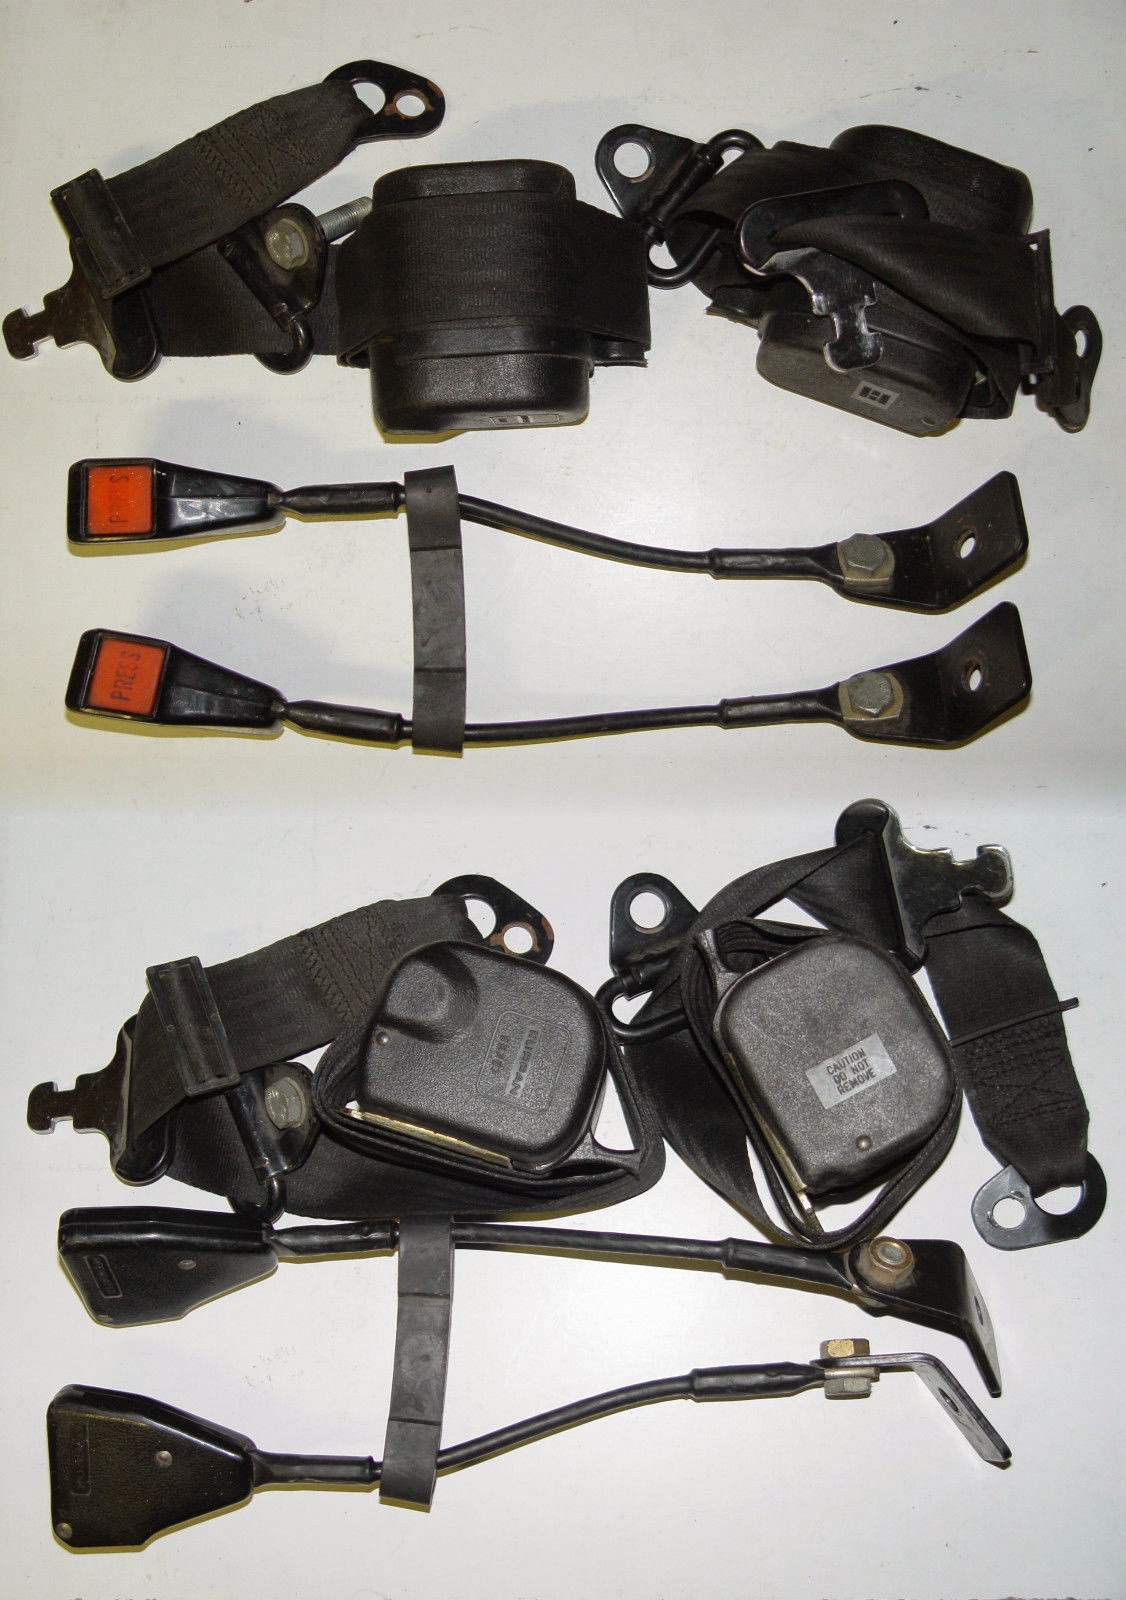 scarpe casual arriva bel design Ferrari 400: Ferrari 400: Klippan Seatbelts compatibility